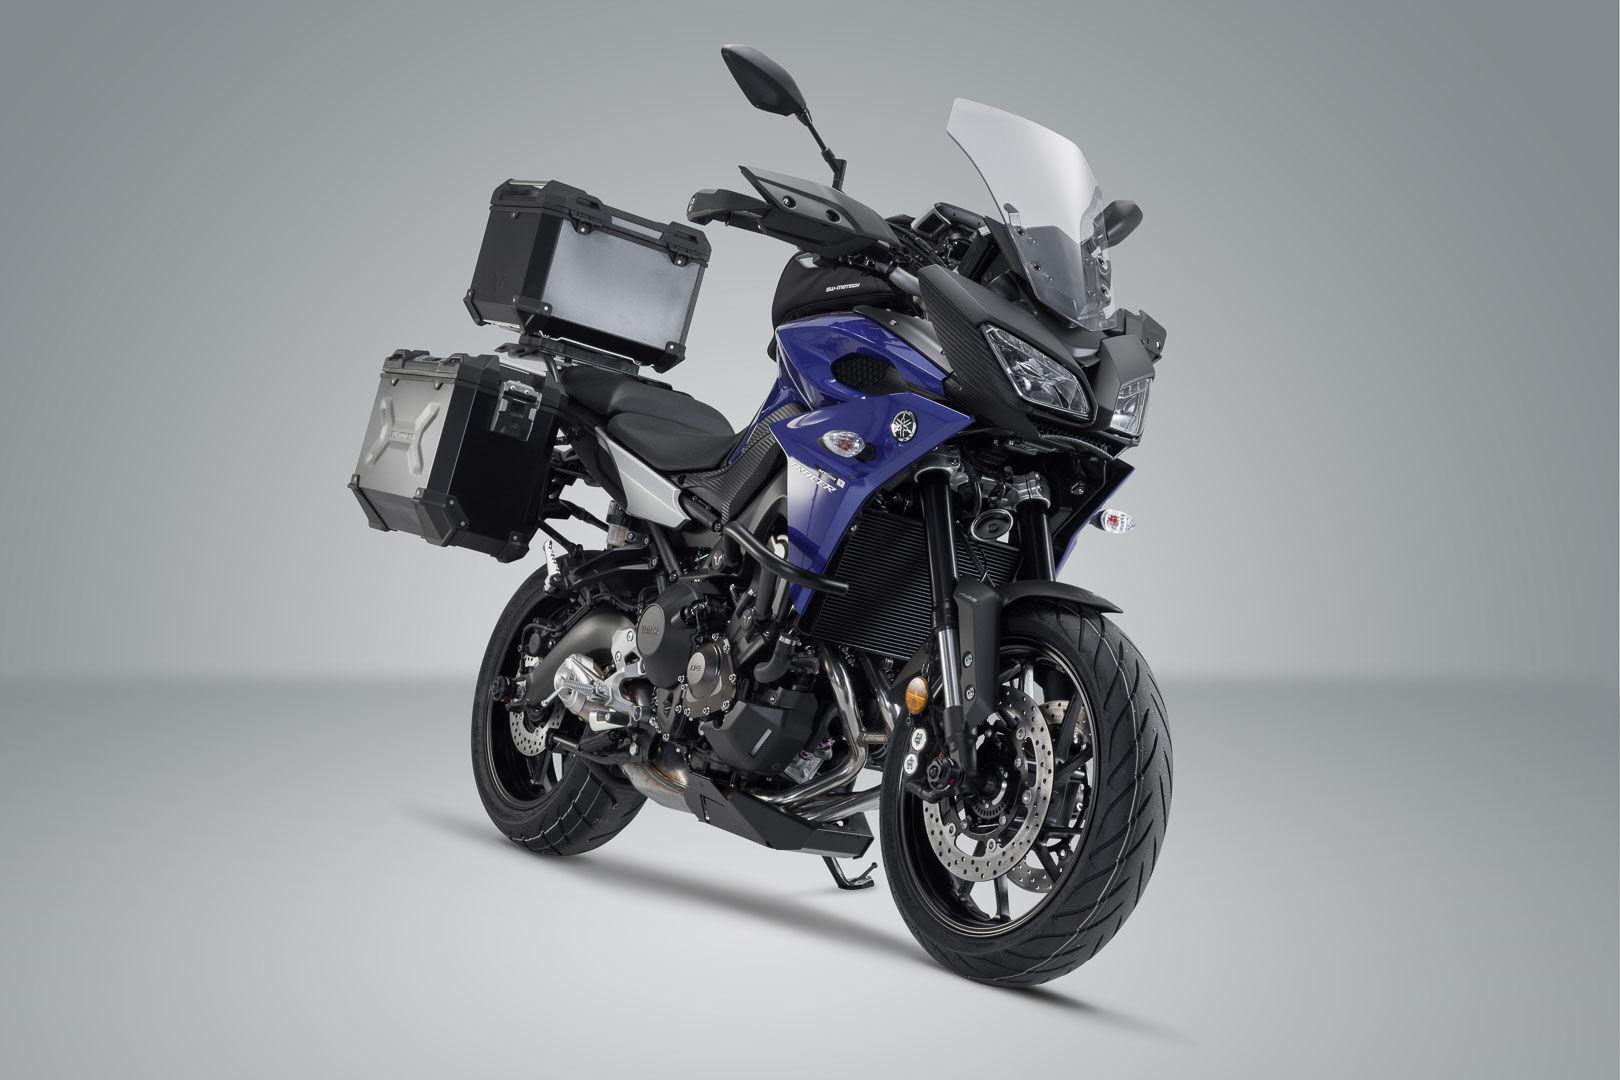 SW-Motech Adventure Yamaha MT-09 Tracer (14-16) Protezione